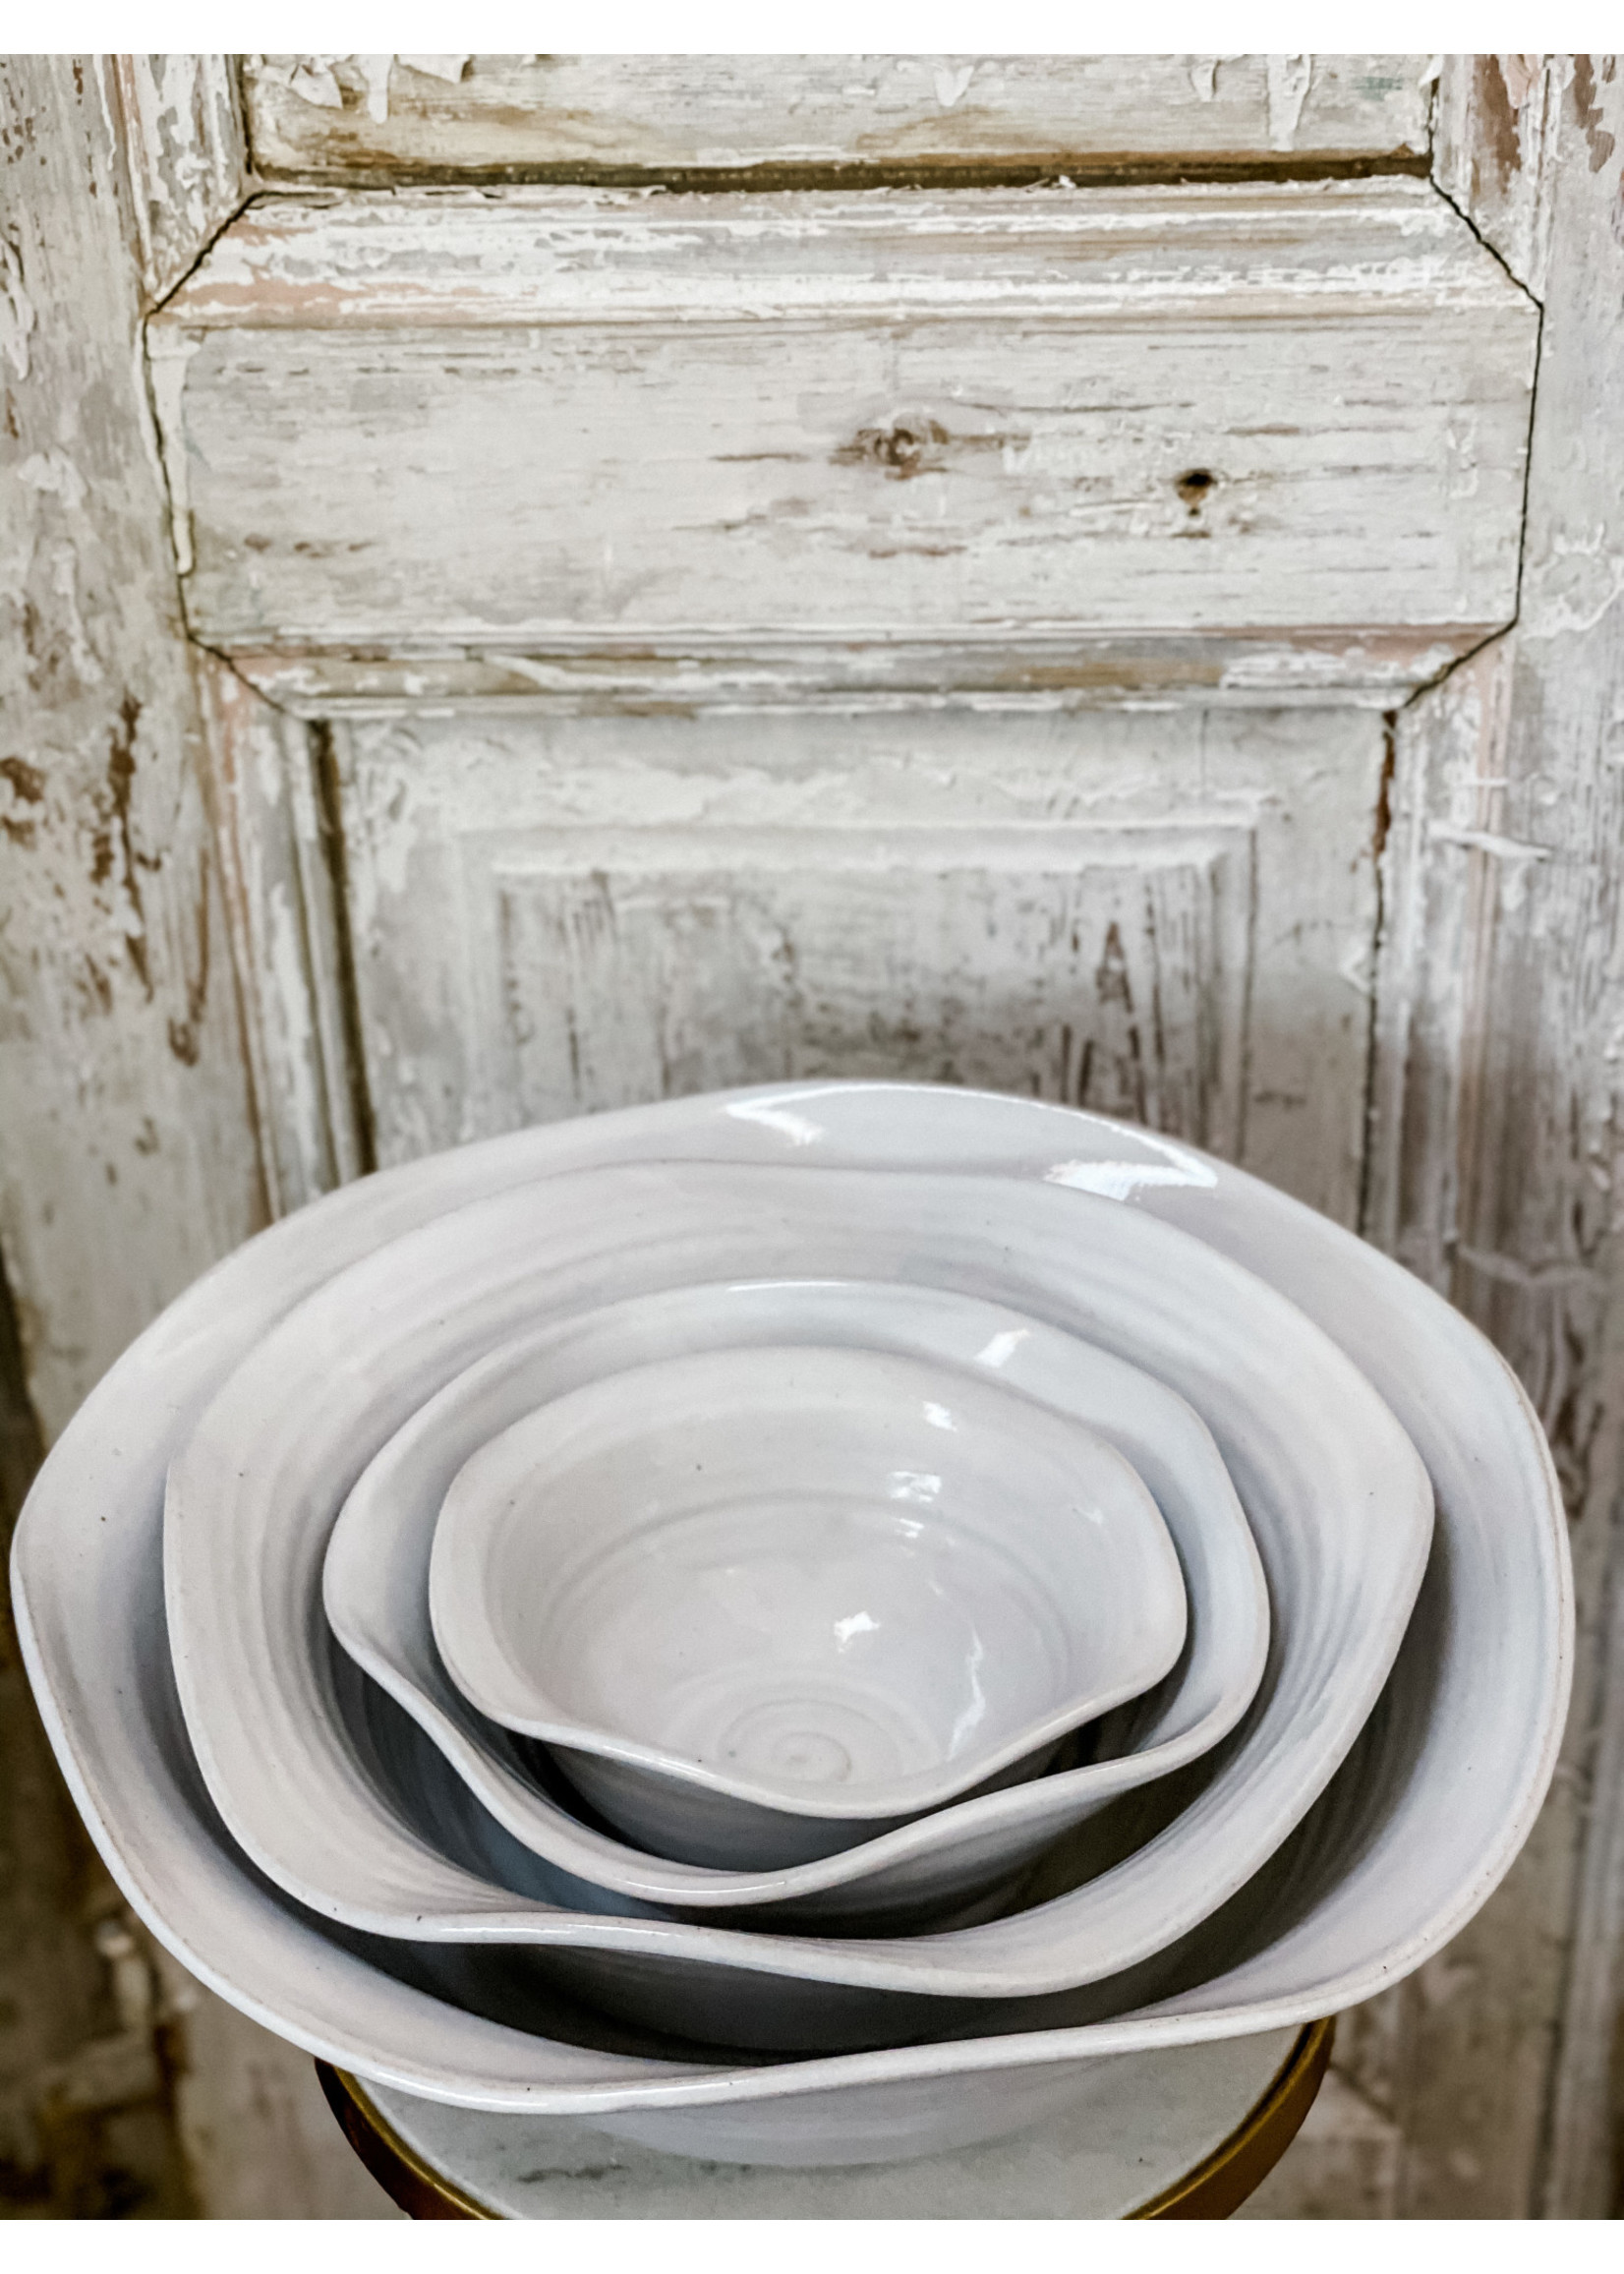 Farmhouse Pottery Windrow - Cereal Bowl